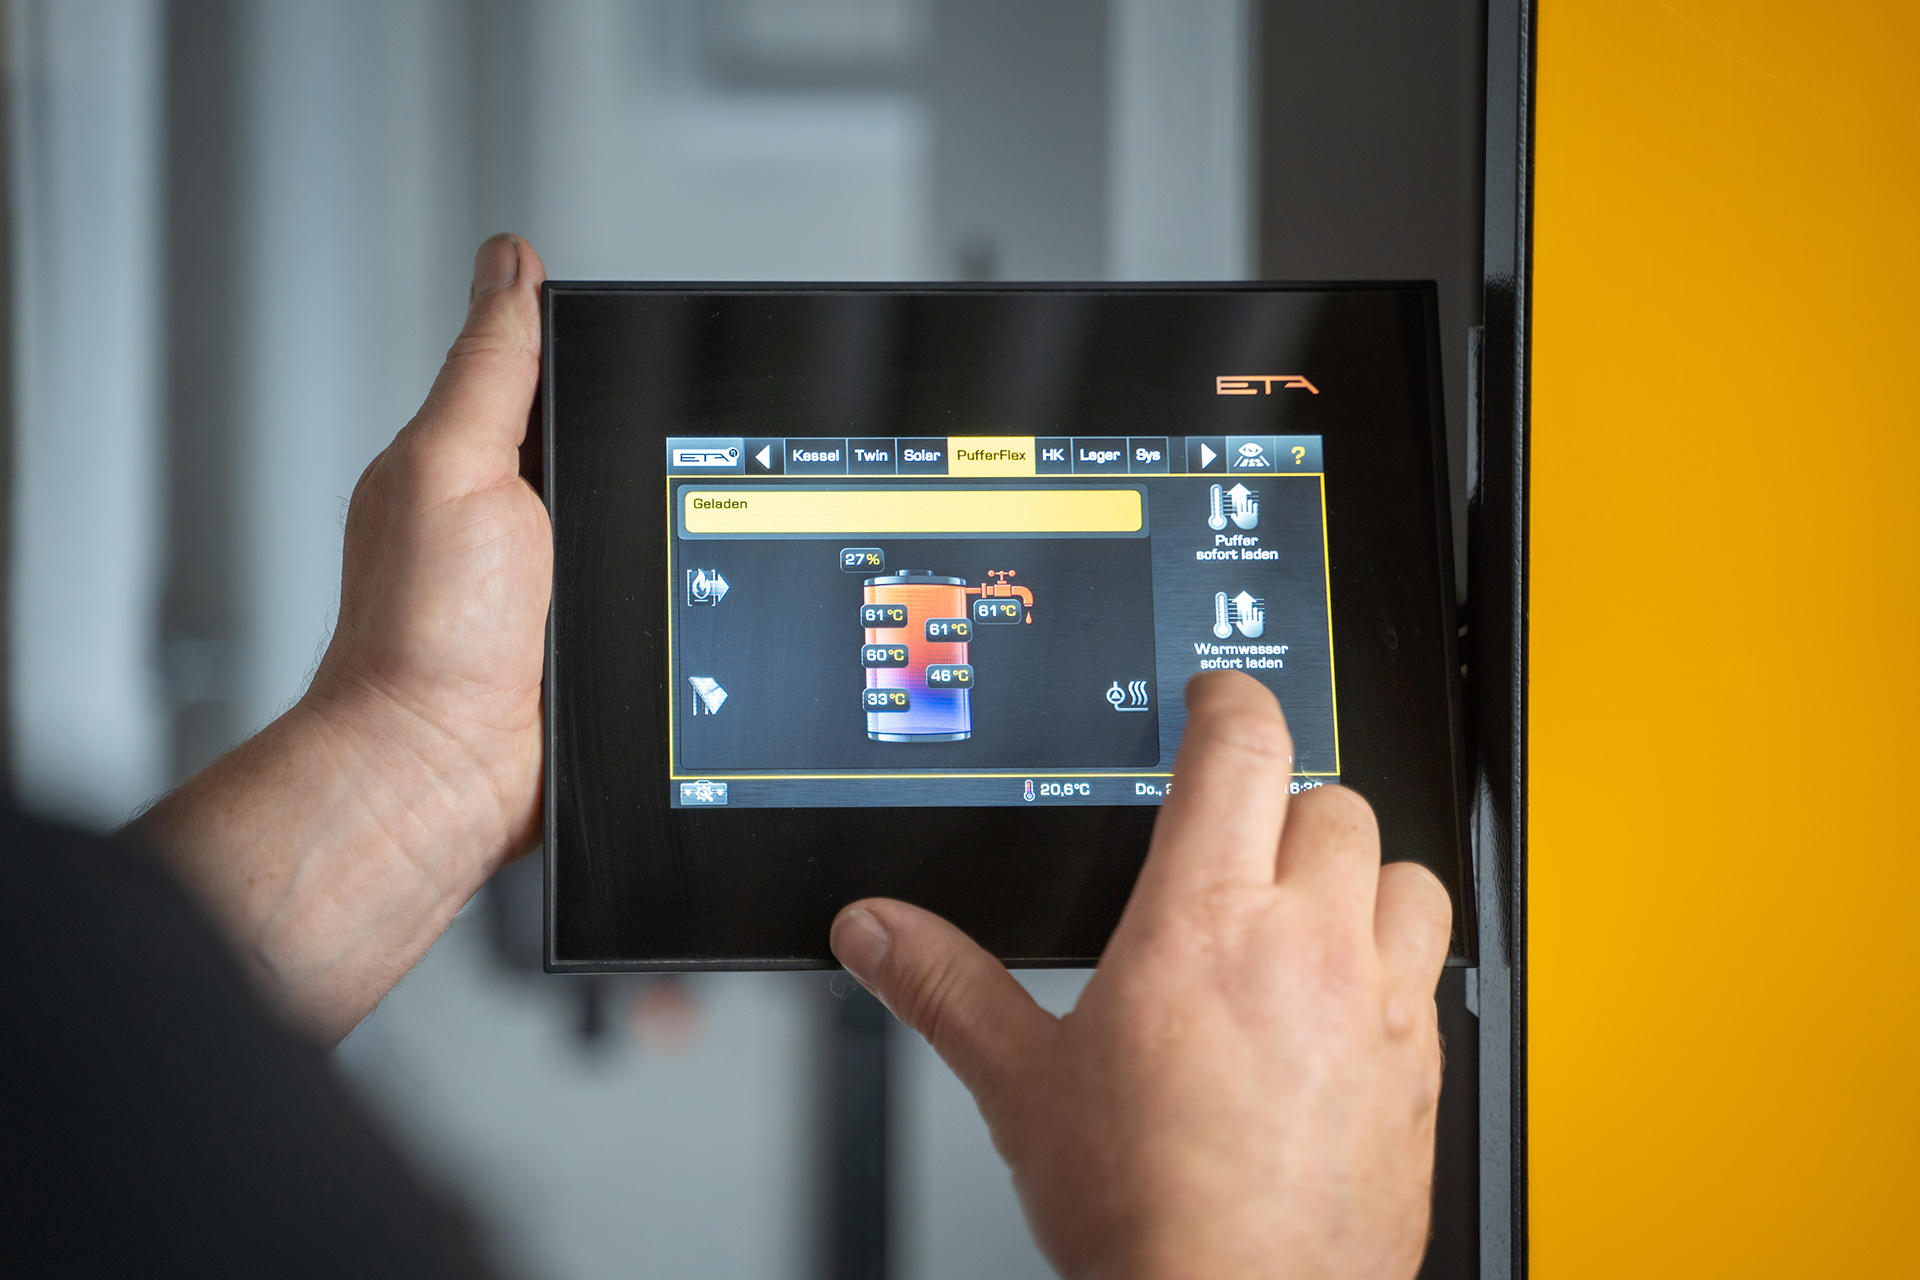 HUCK-Haustechnik-Heizung-Referenz-Touchpanel-Service